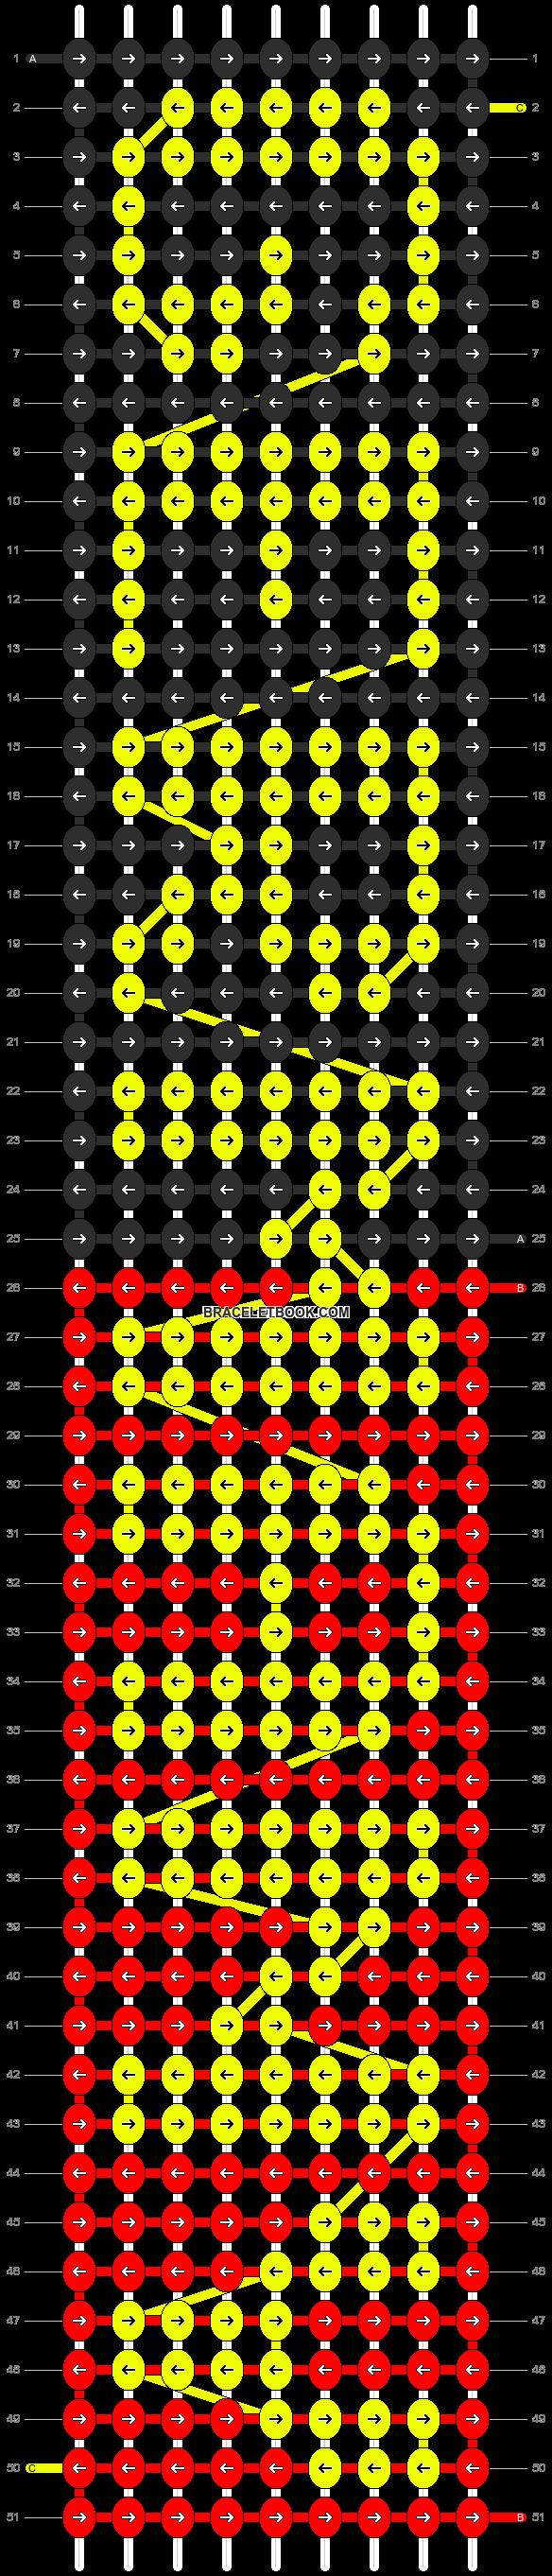 Alpha pattern #7055 pattern